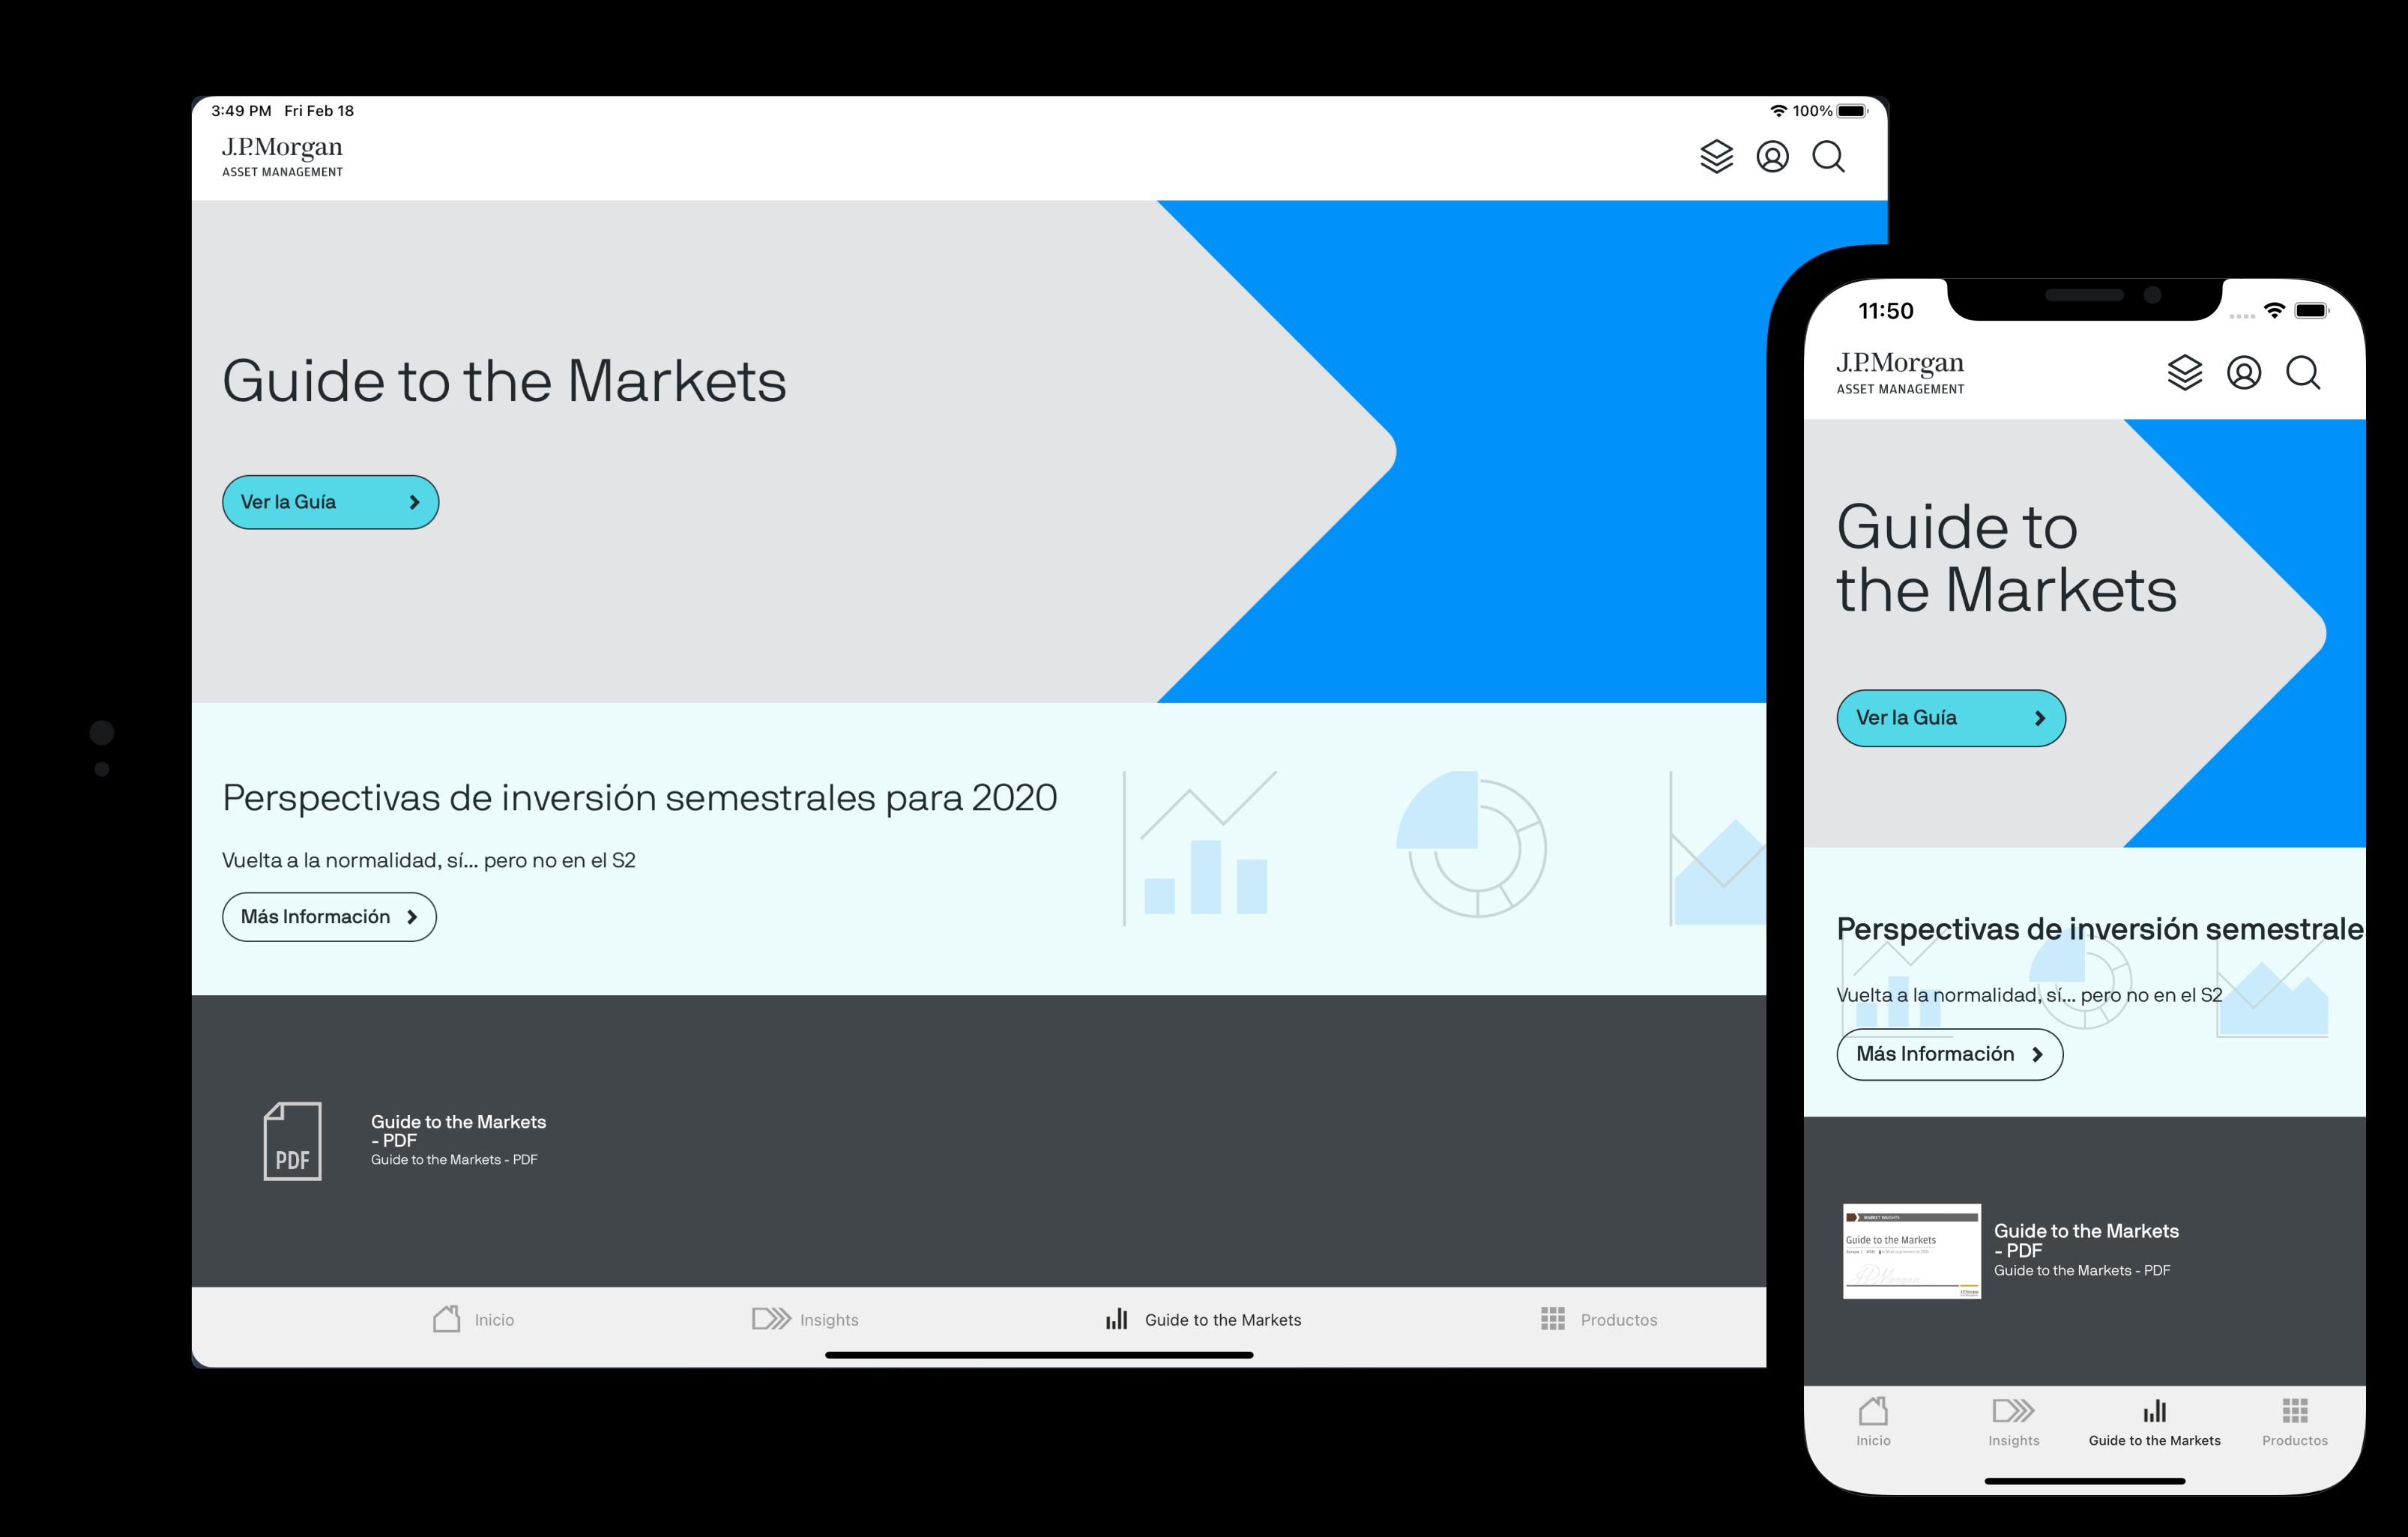 insights-app-image-1-es